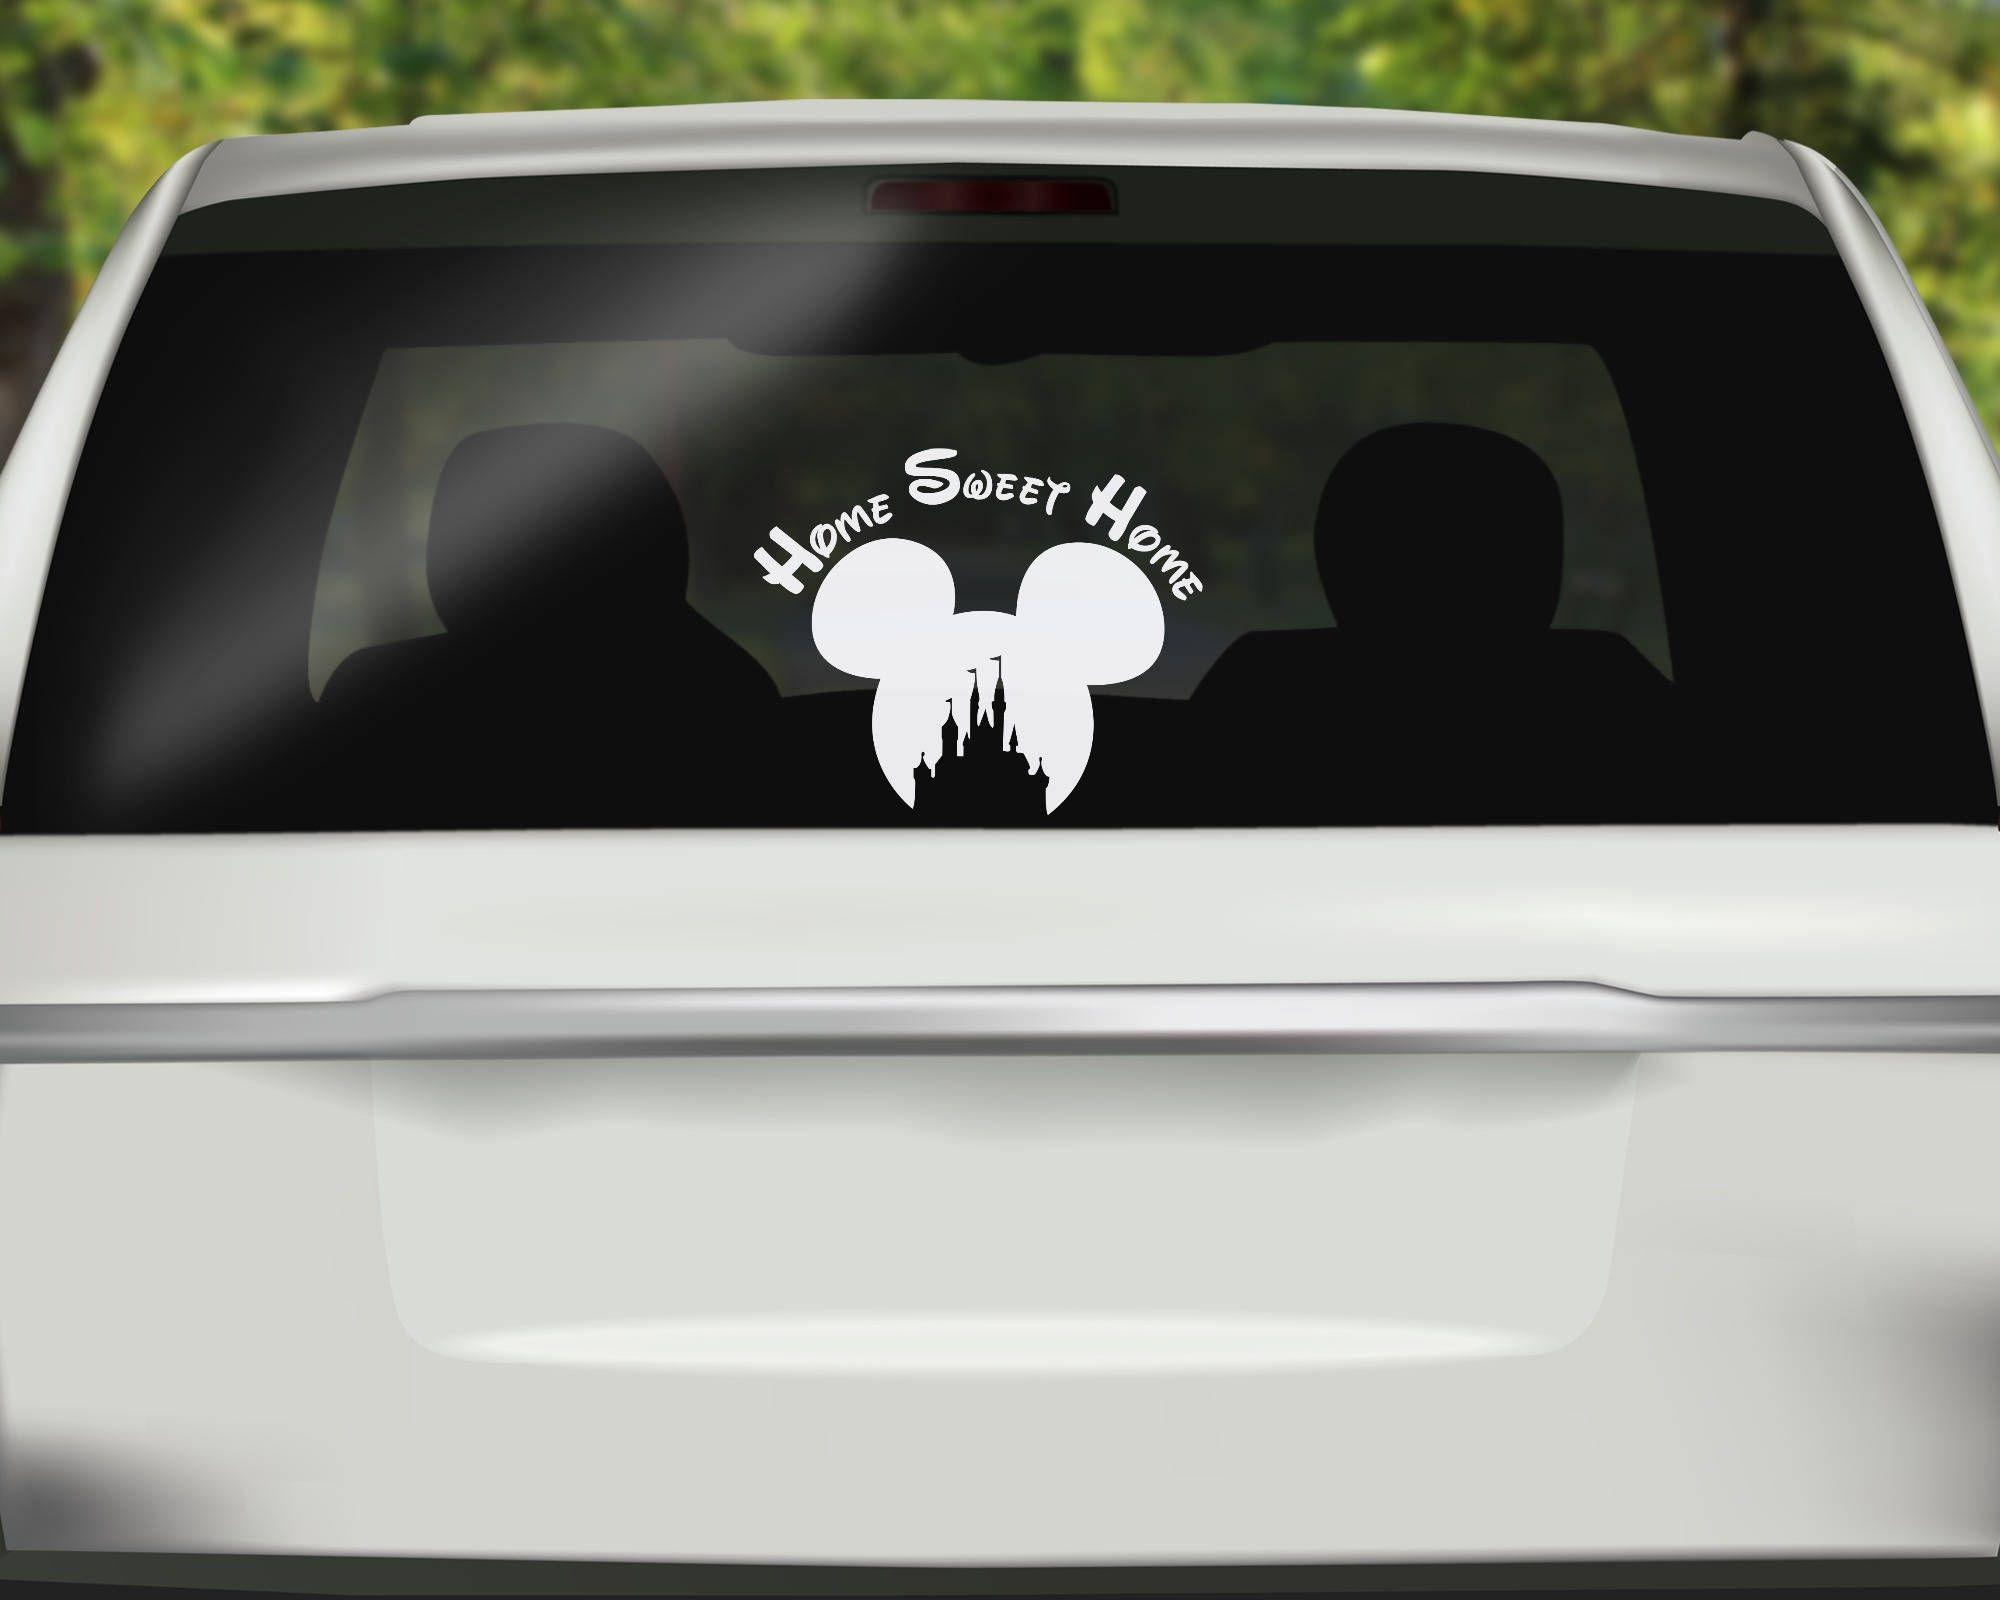 Bumper sticker design tips - Bumper Sticker Design Ideas Disney Home Sweet Home Decal Mickey Ears Decal Princess Castle Sticker